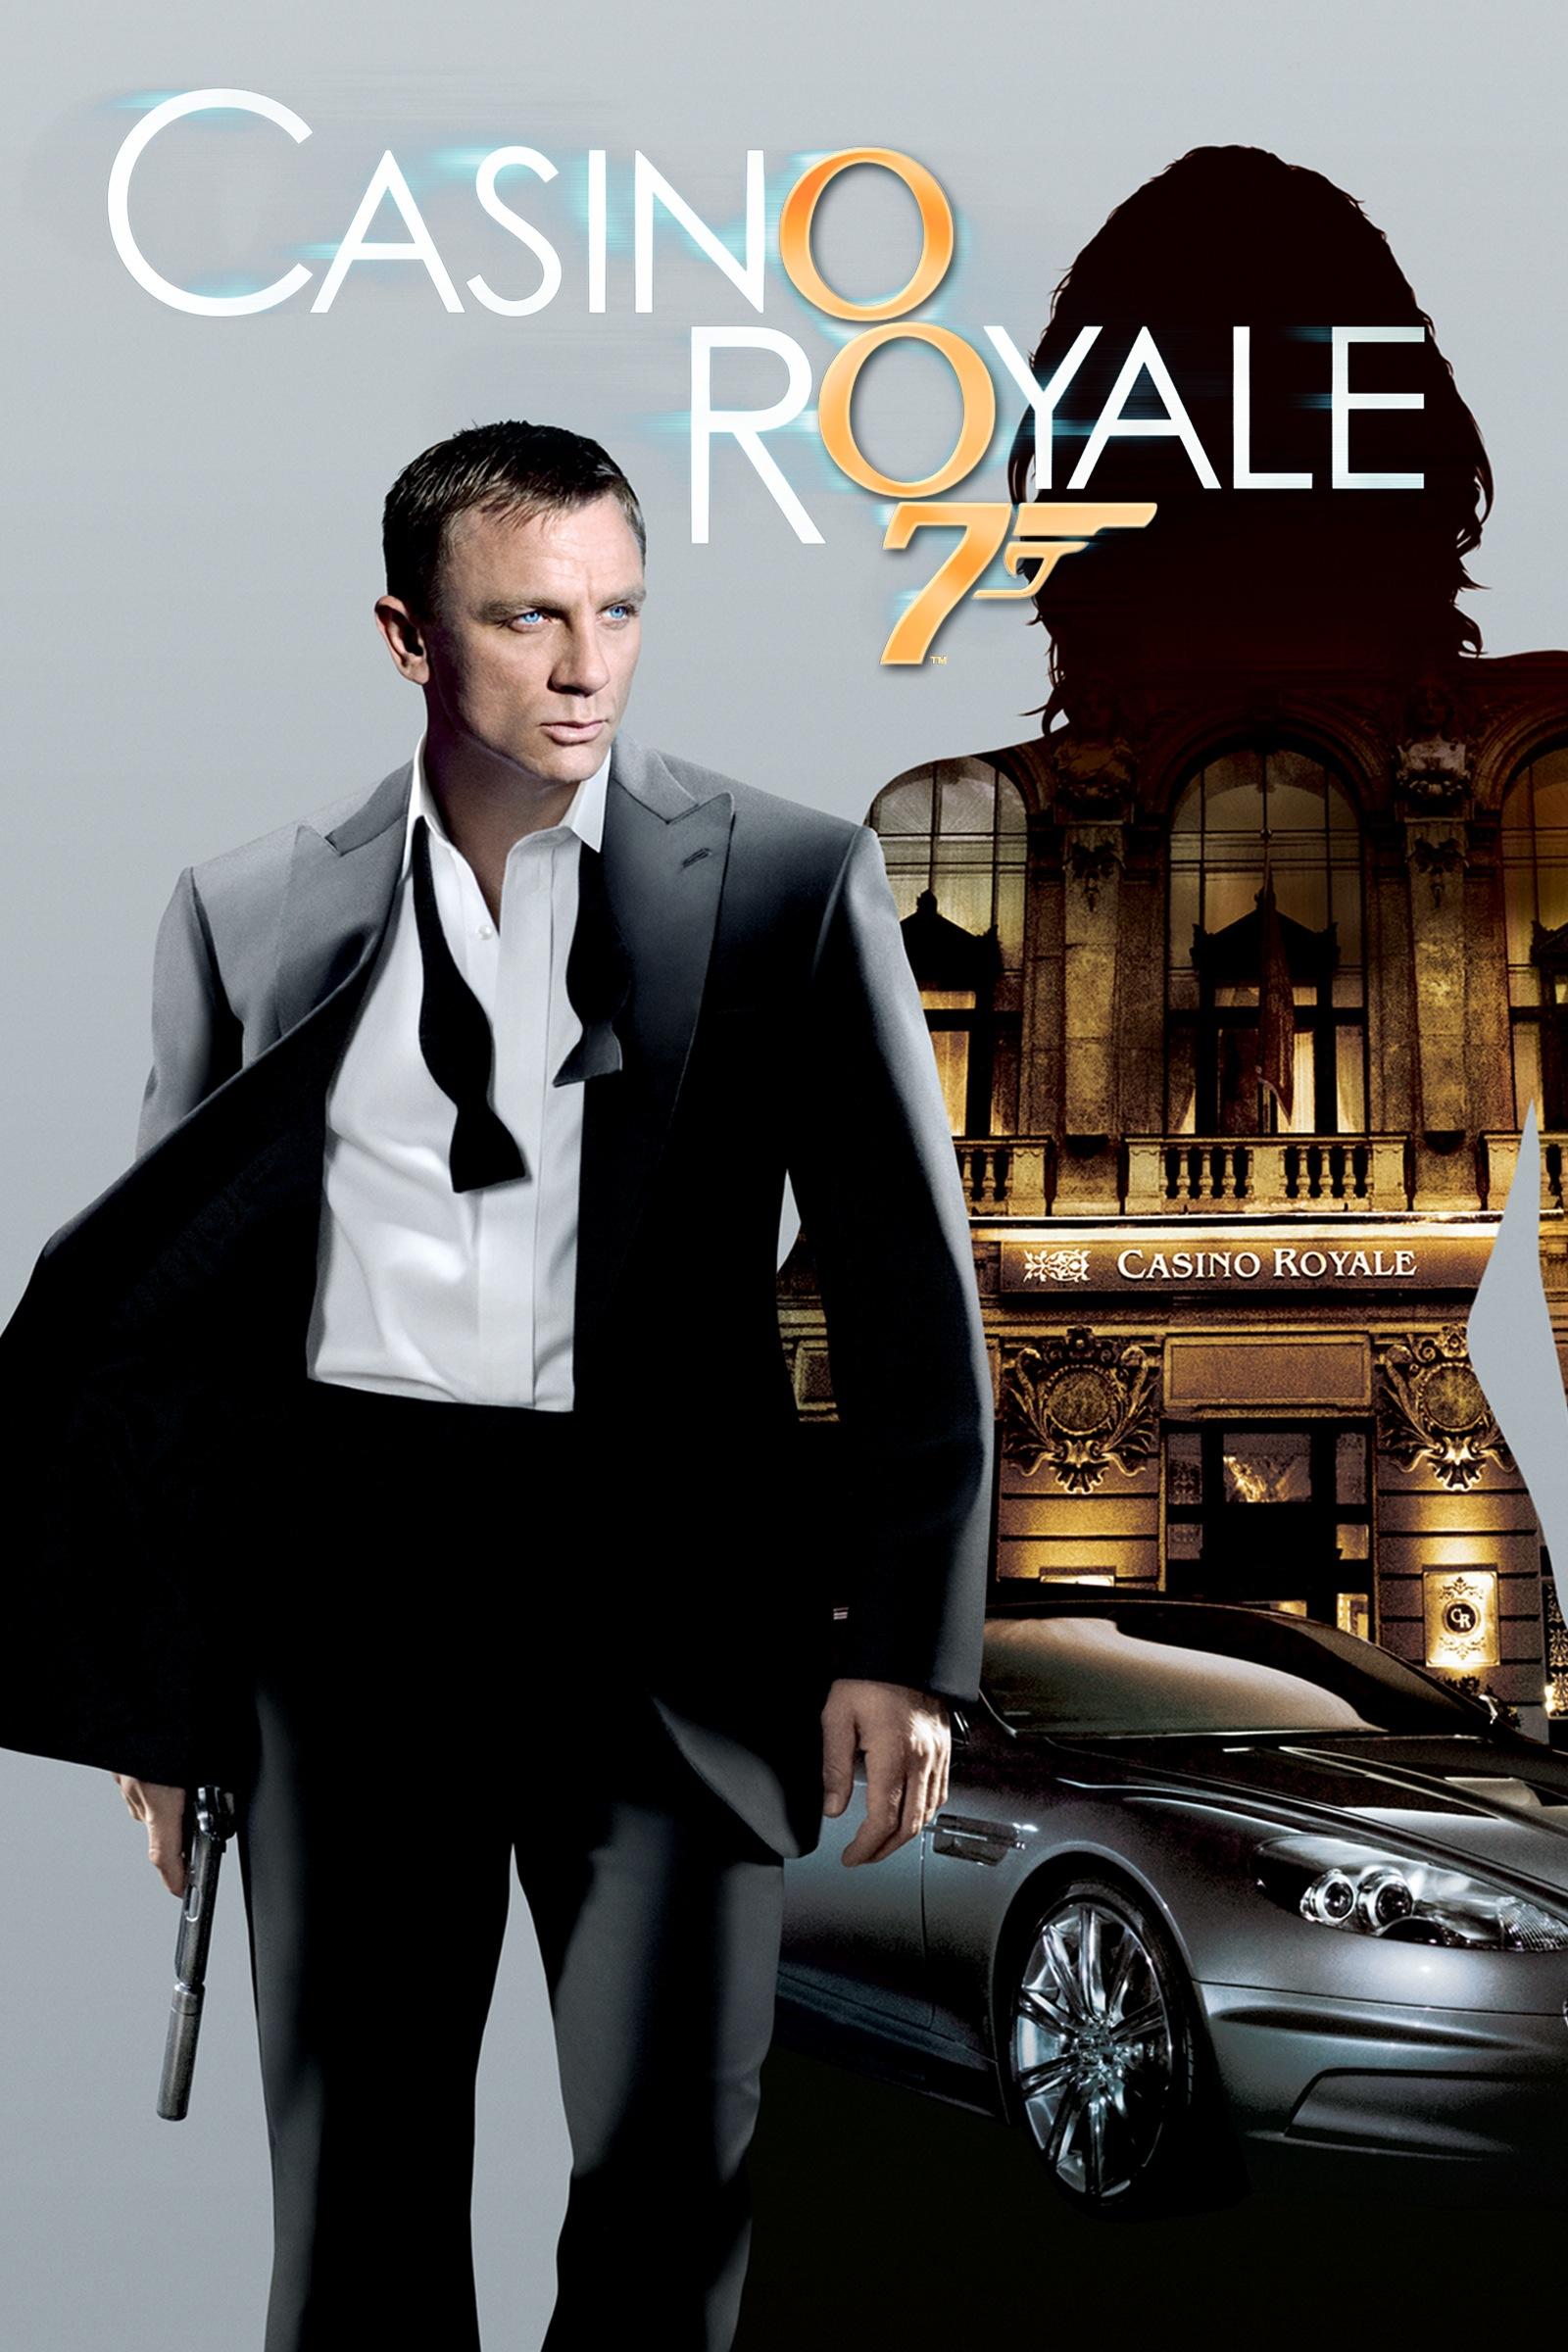 007 james bond casino royale password gambling national addiction or harmless pastime